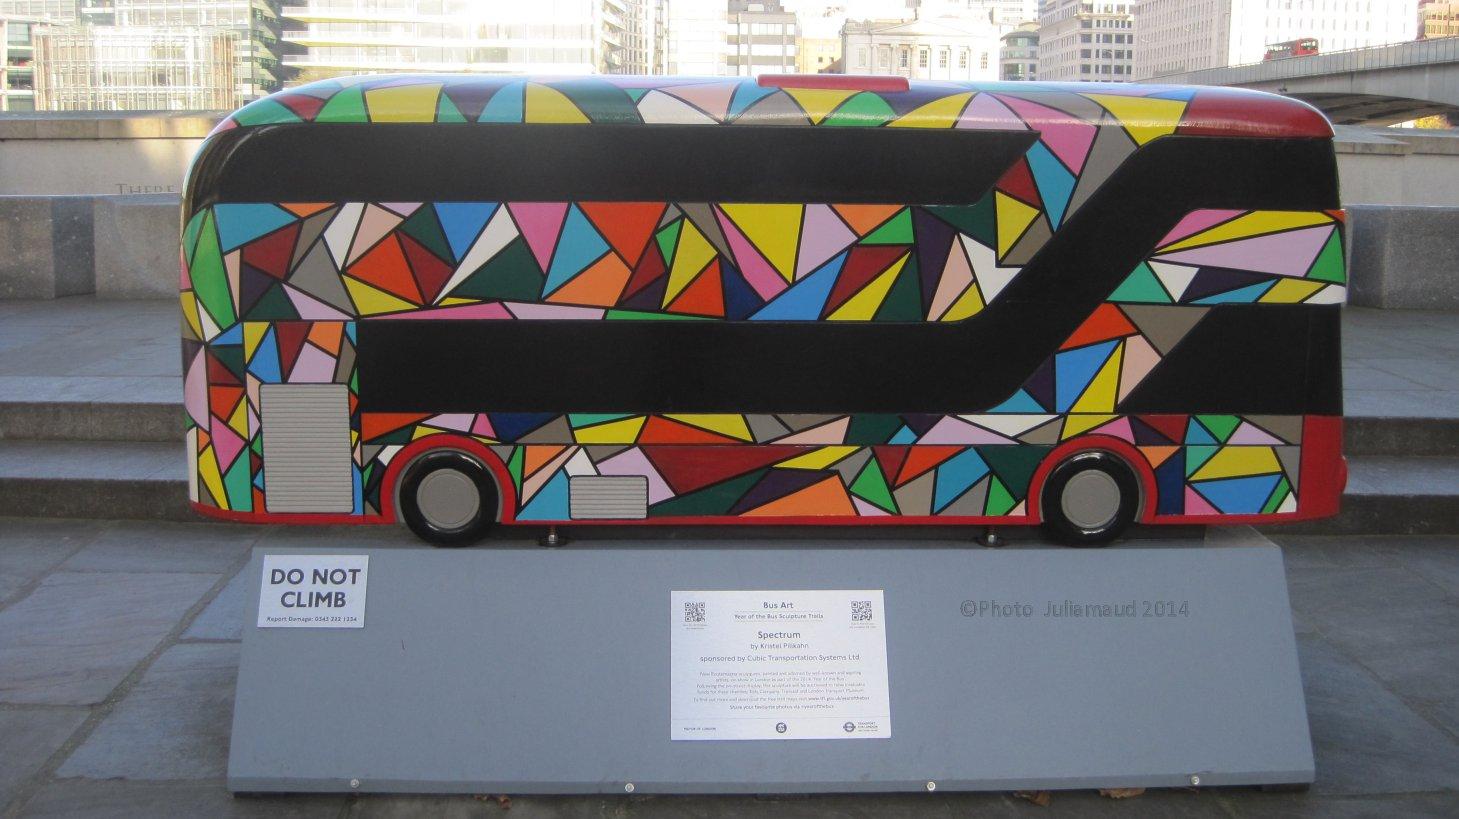 Bus at Southwark by Juliamaud